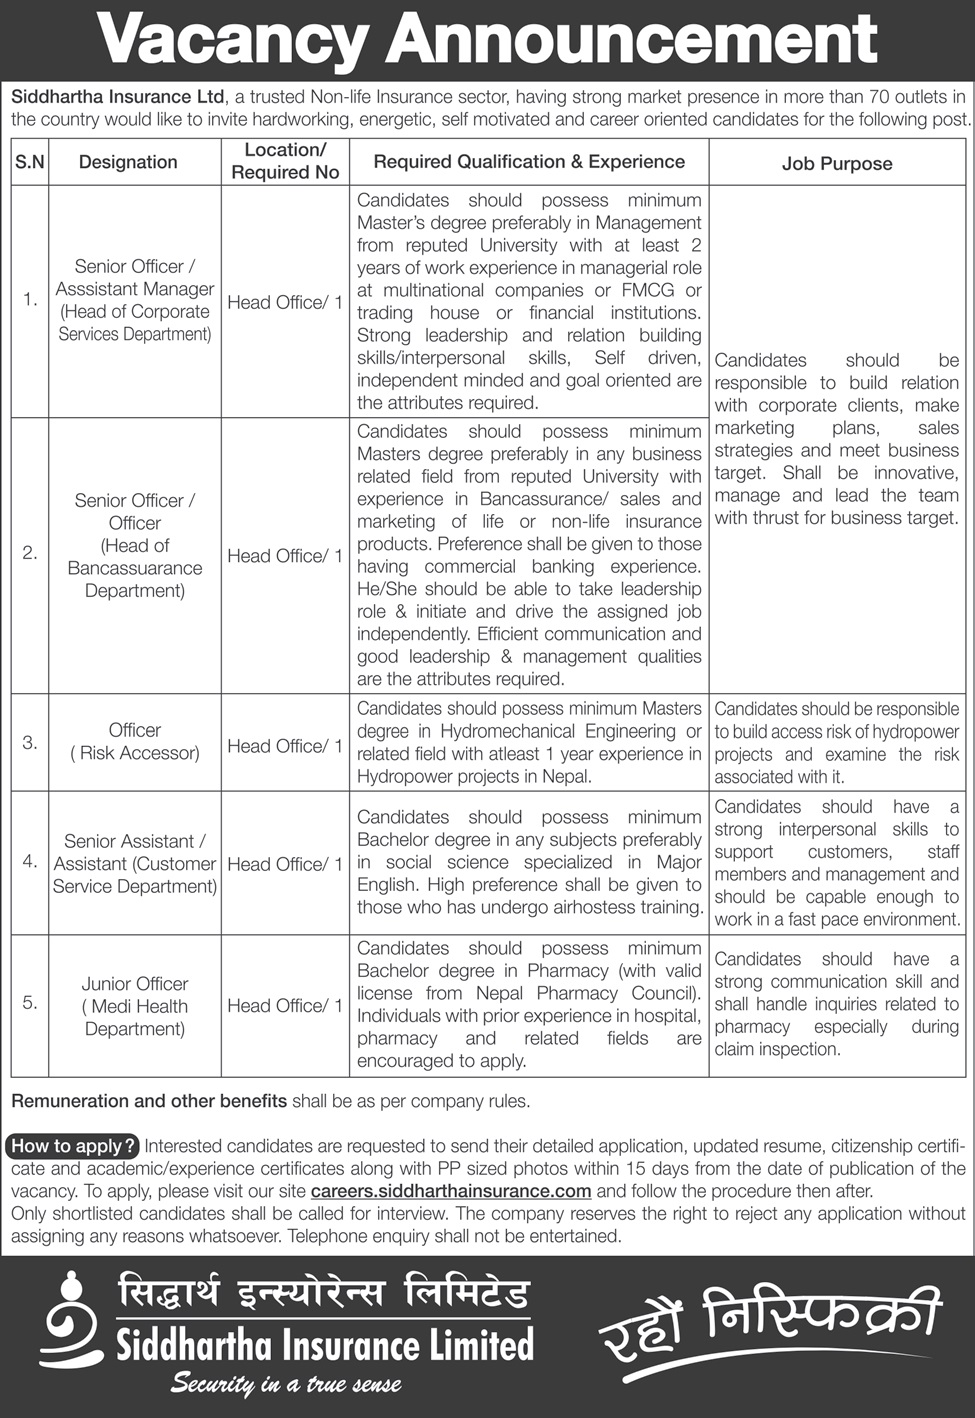 Siddhartha Insurance Limited Vacancy